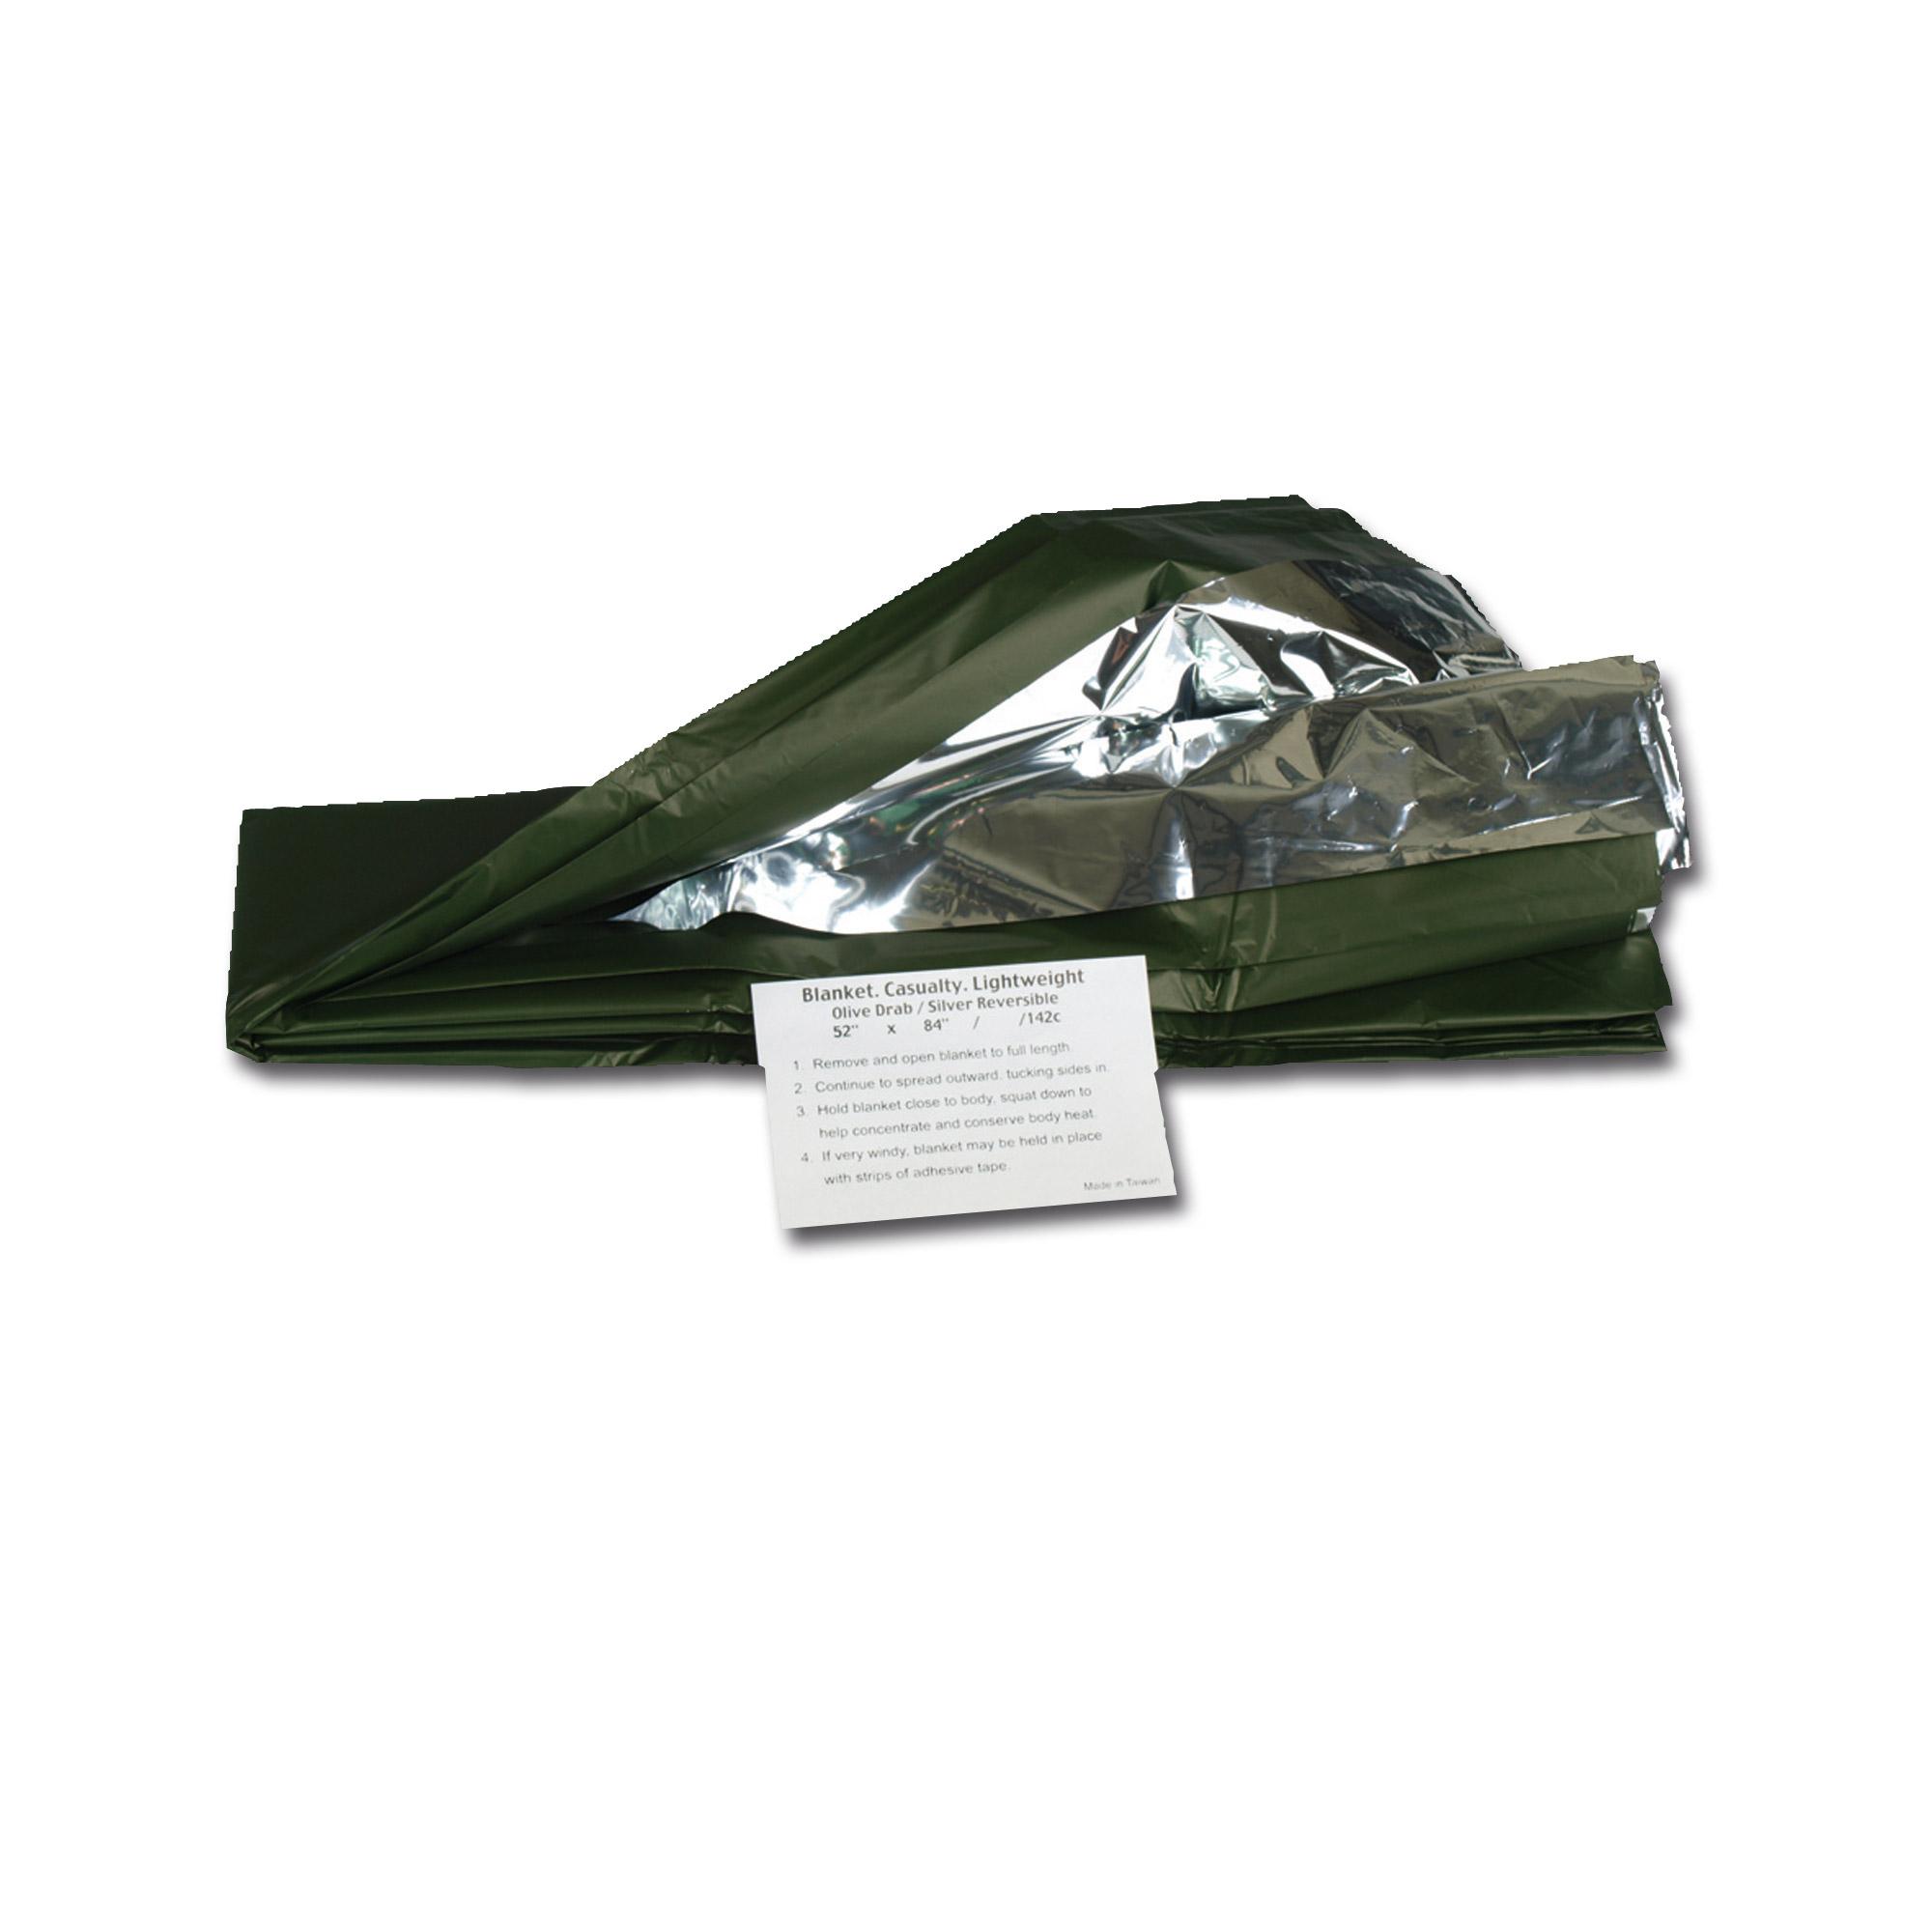 Rettungsdecke silber/oliv